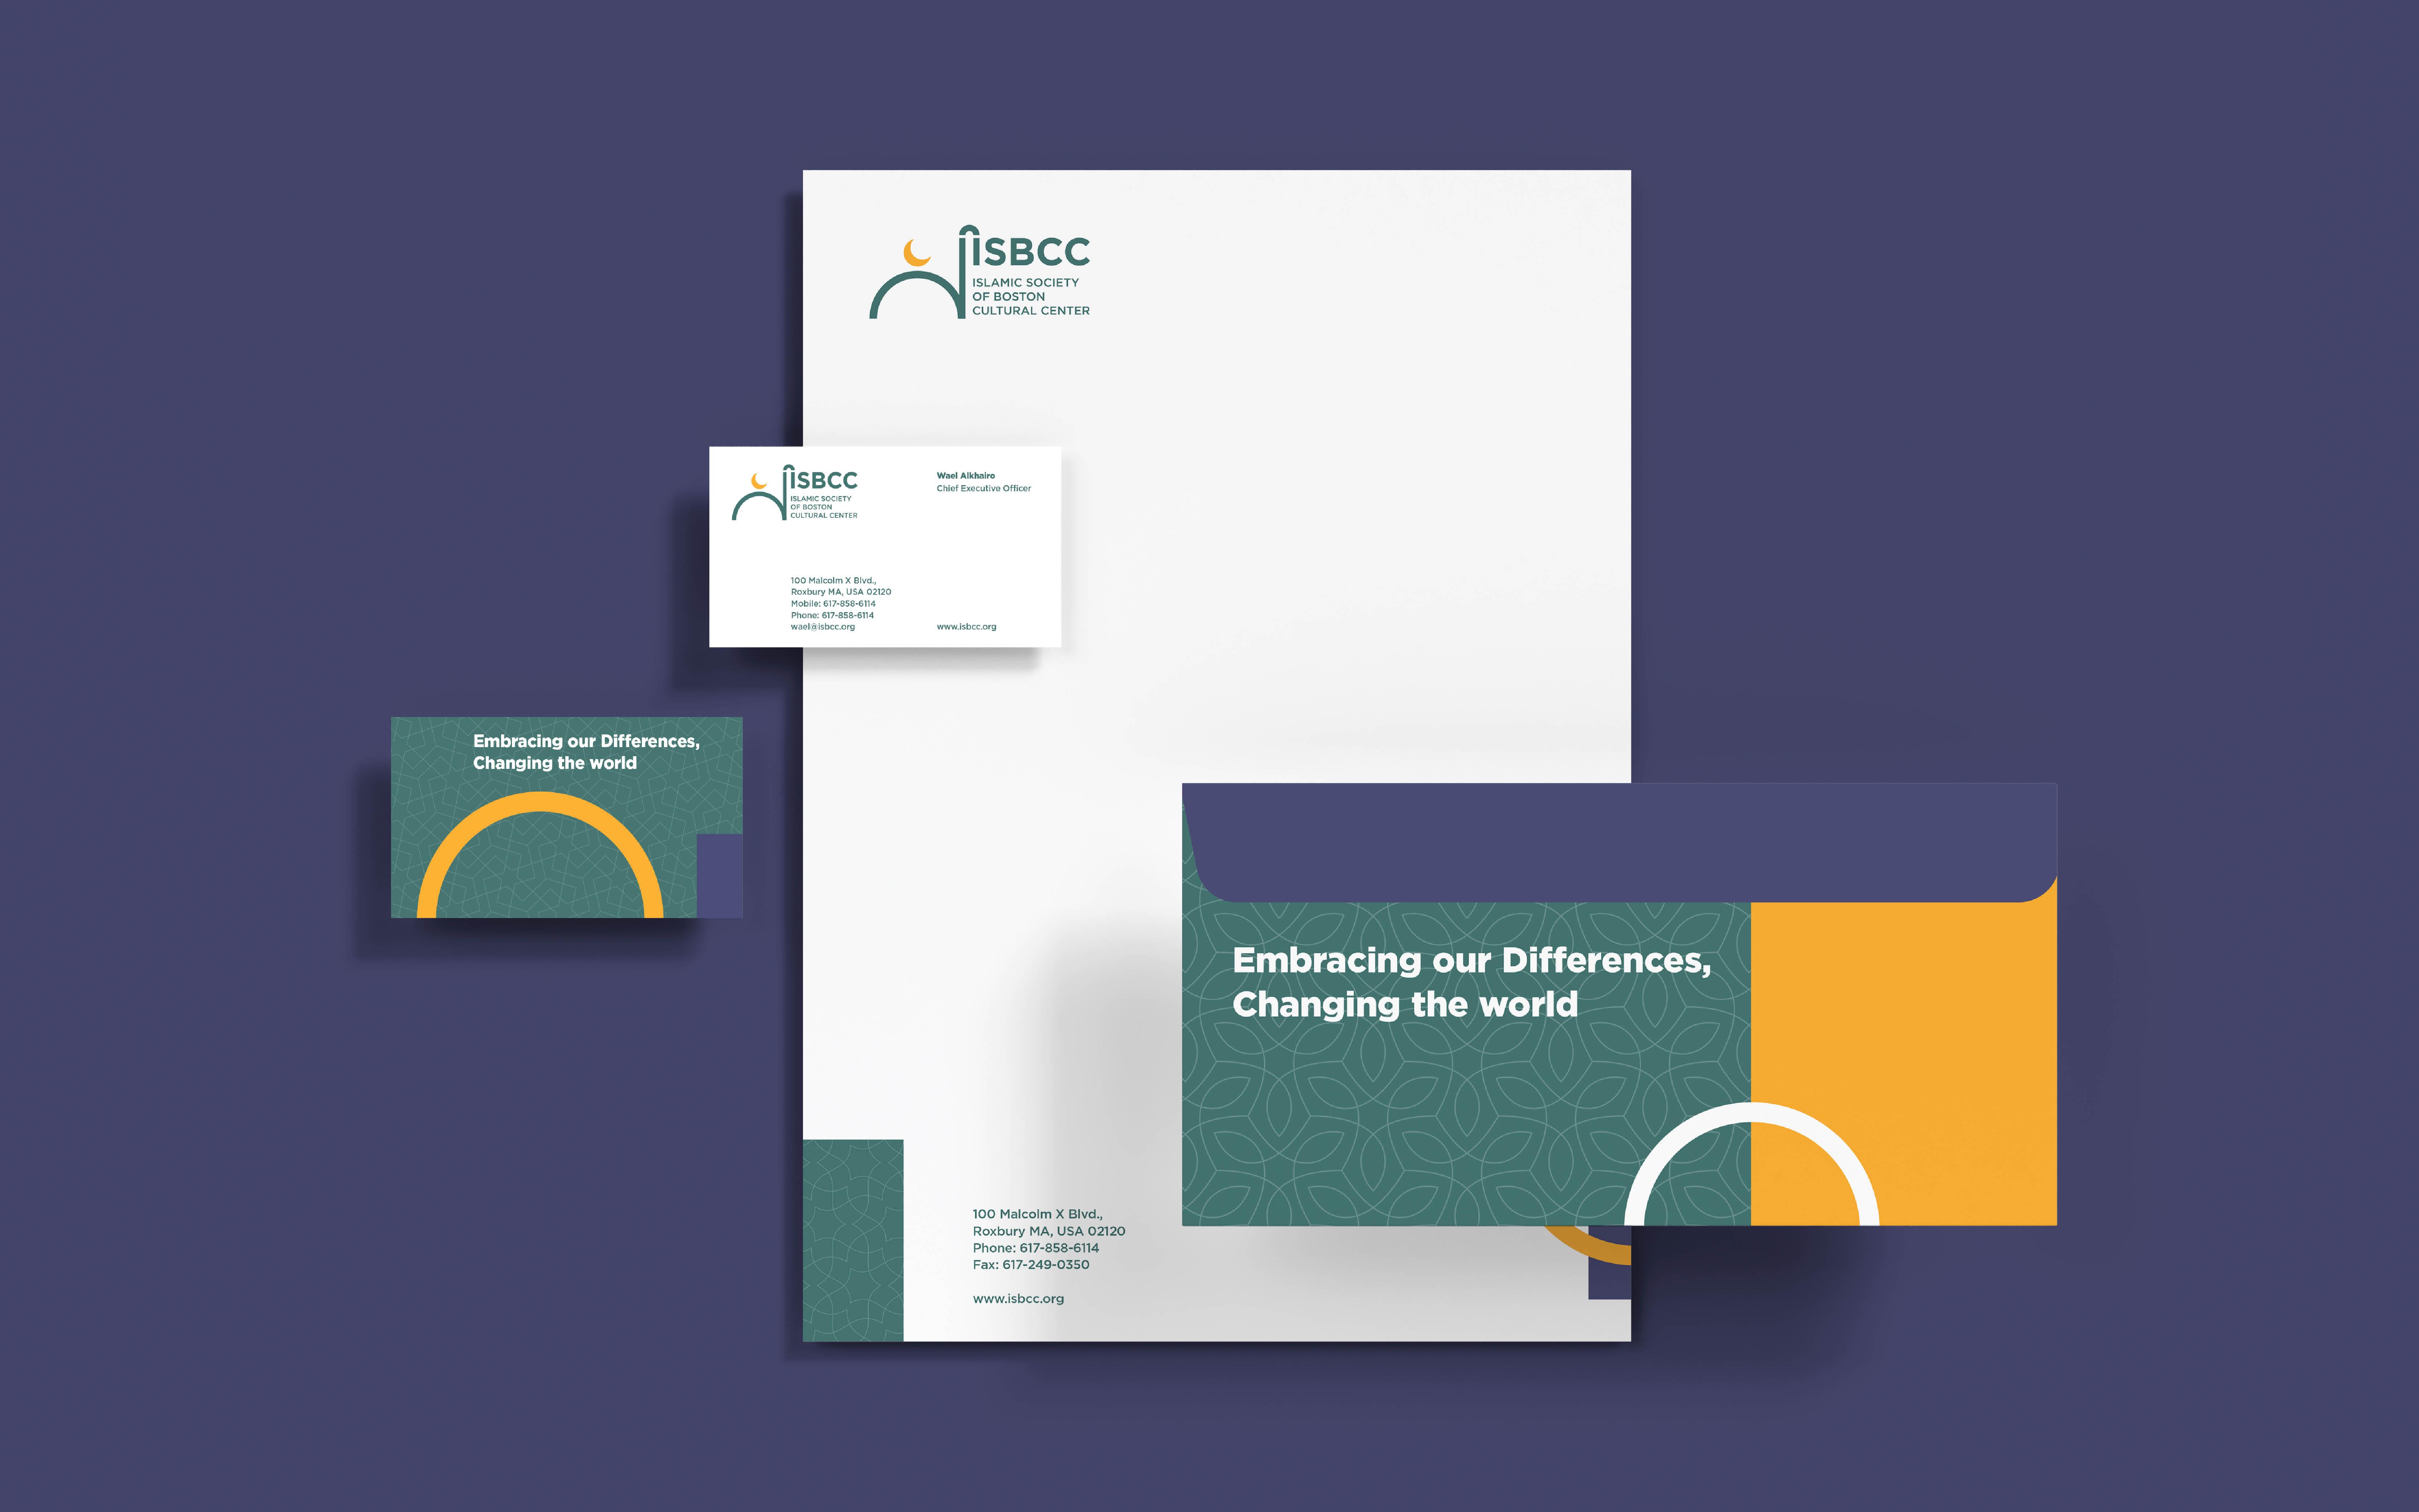 ISBCC_Branding2